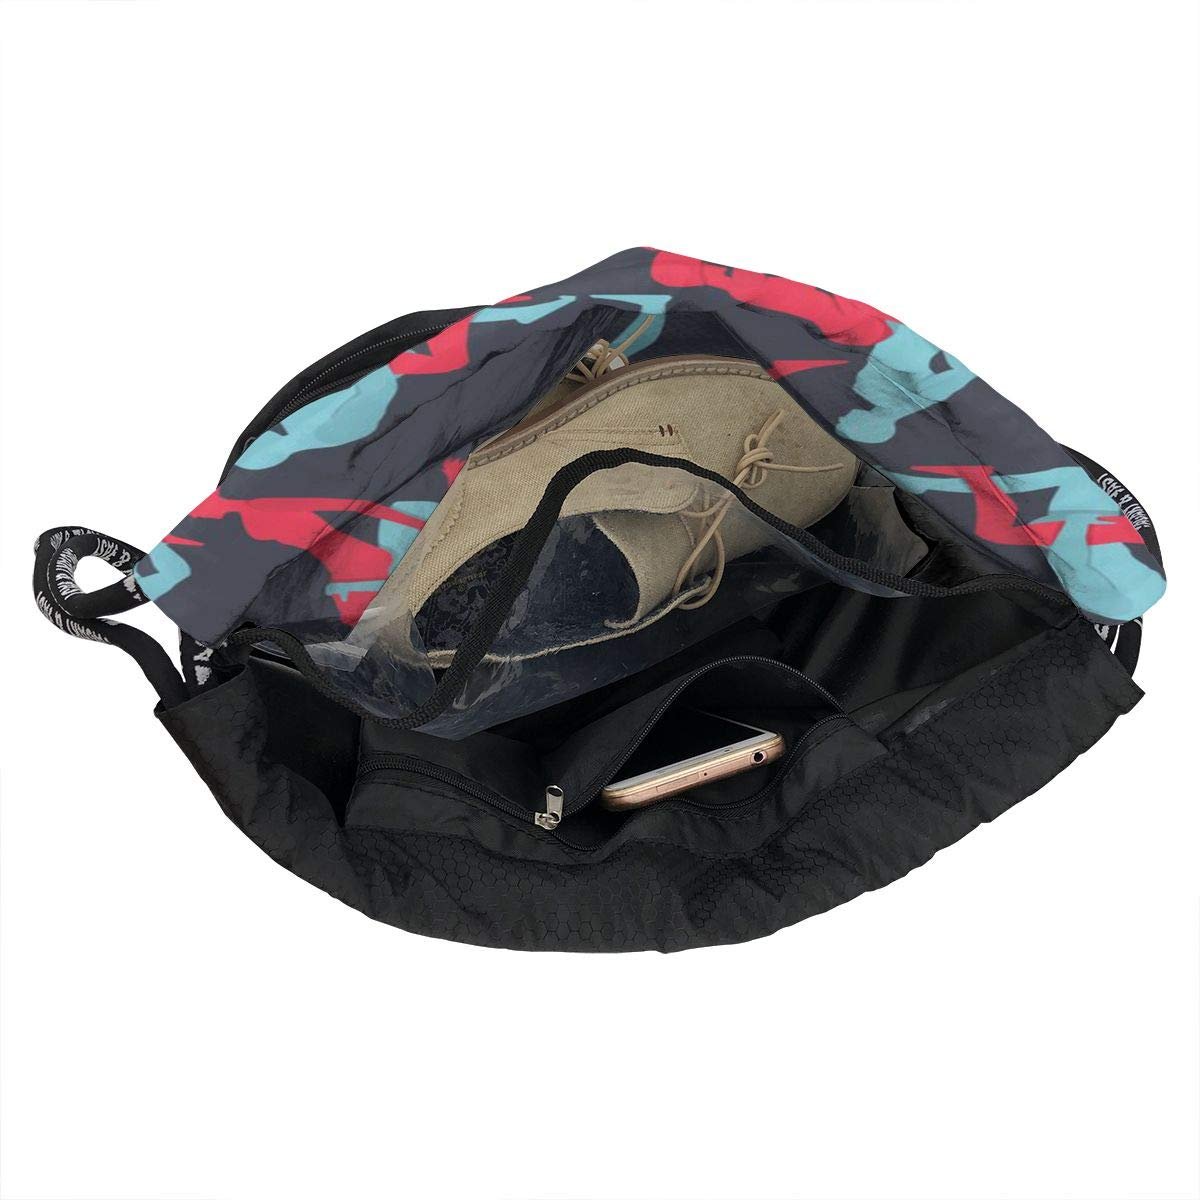 Zol1Q Multipurpose Drawstring Bag for Men /& Women Sex Cinch Backpack Tote Sack Large Storage Sackpack for Gym Travel Hiking